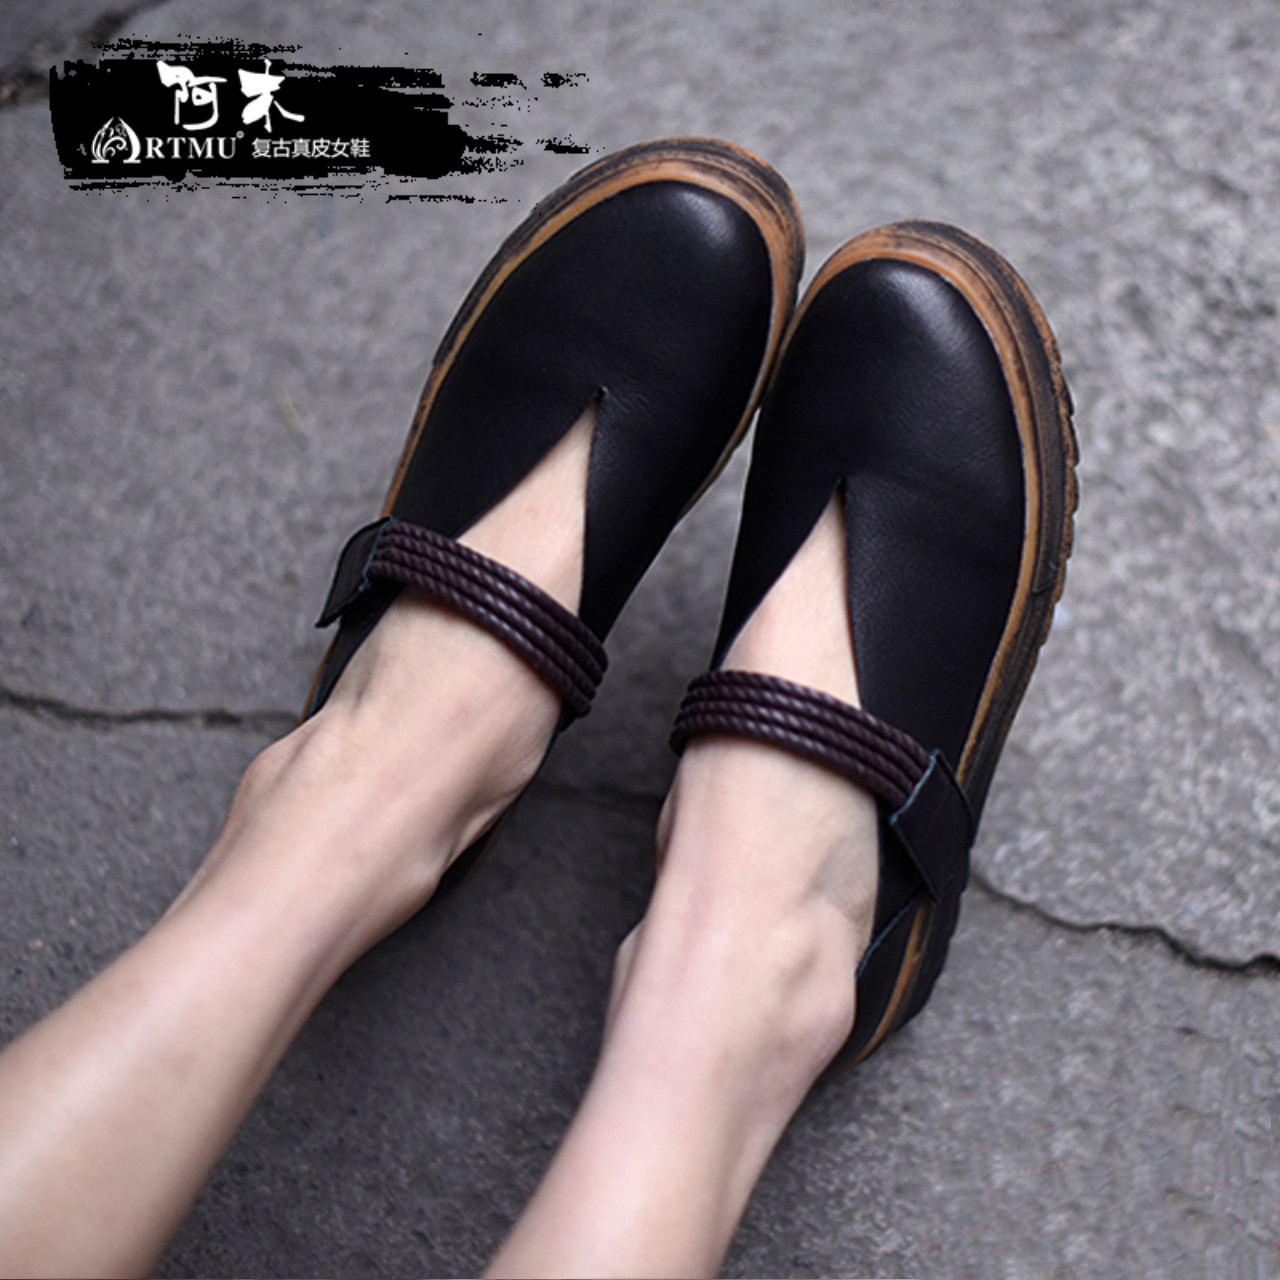 Здесь можно купить  Artmu Original Art Thick Sole Shallow Mouth Women Shoes Spring New Genuine Leather Handmade Platform Flat Shoes 806-6  Обувь